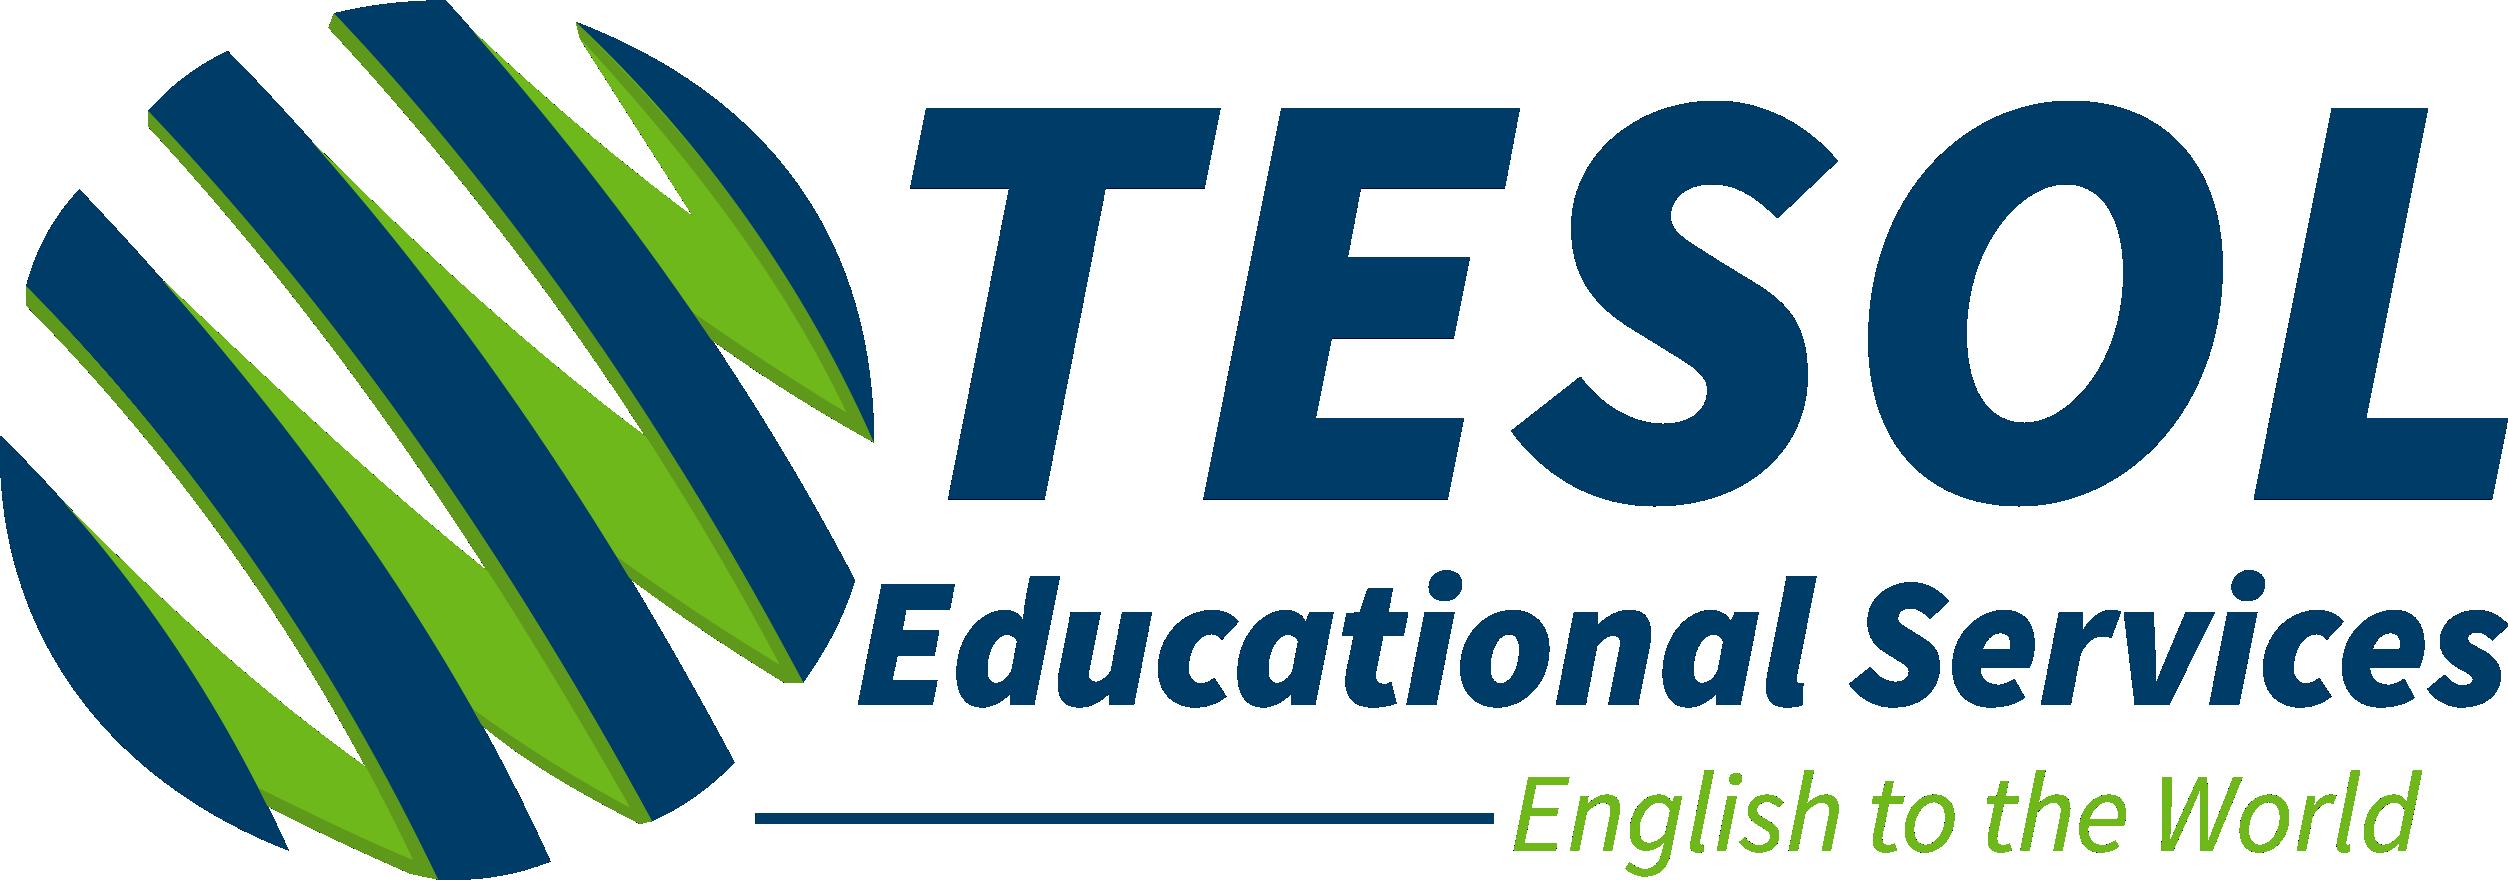 TESOL Educational Services Logo